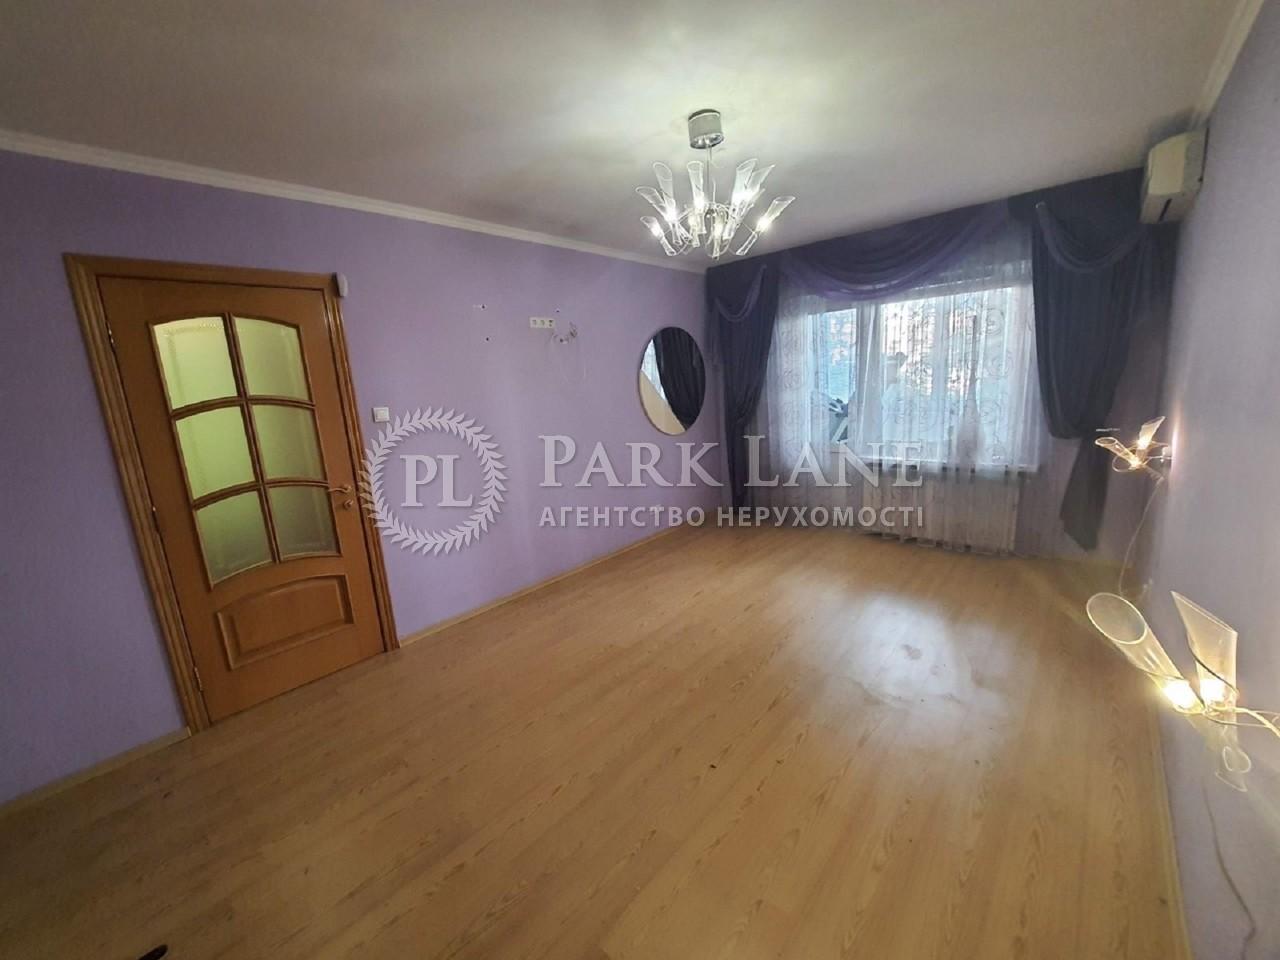 Квартира ул. Милютенко, 17в, Киев, Z-704817 - Фото 5